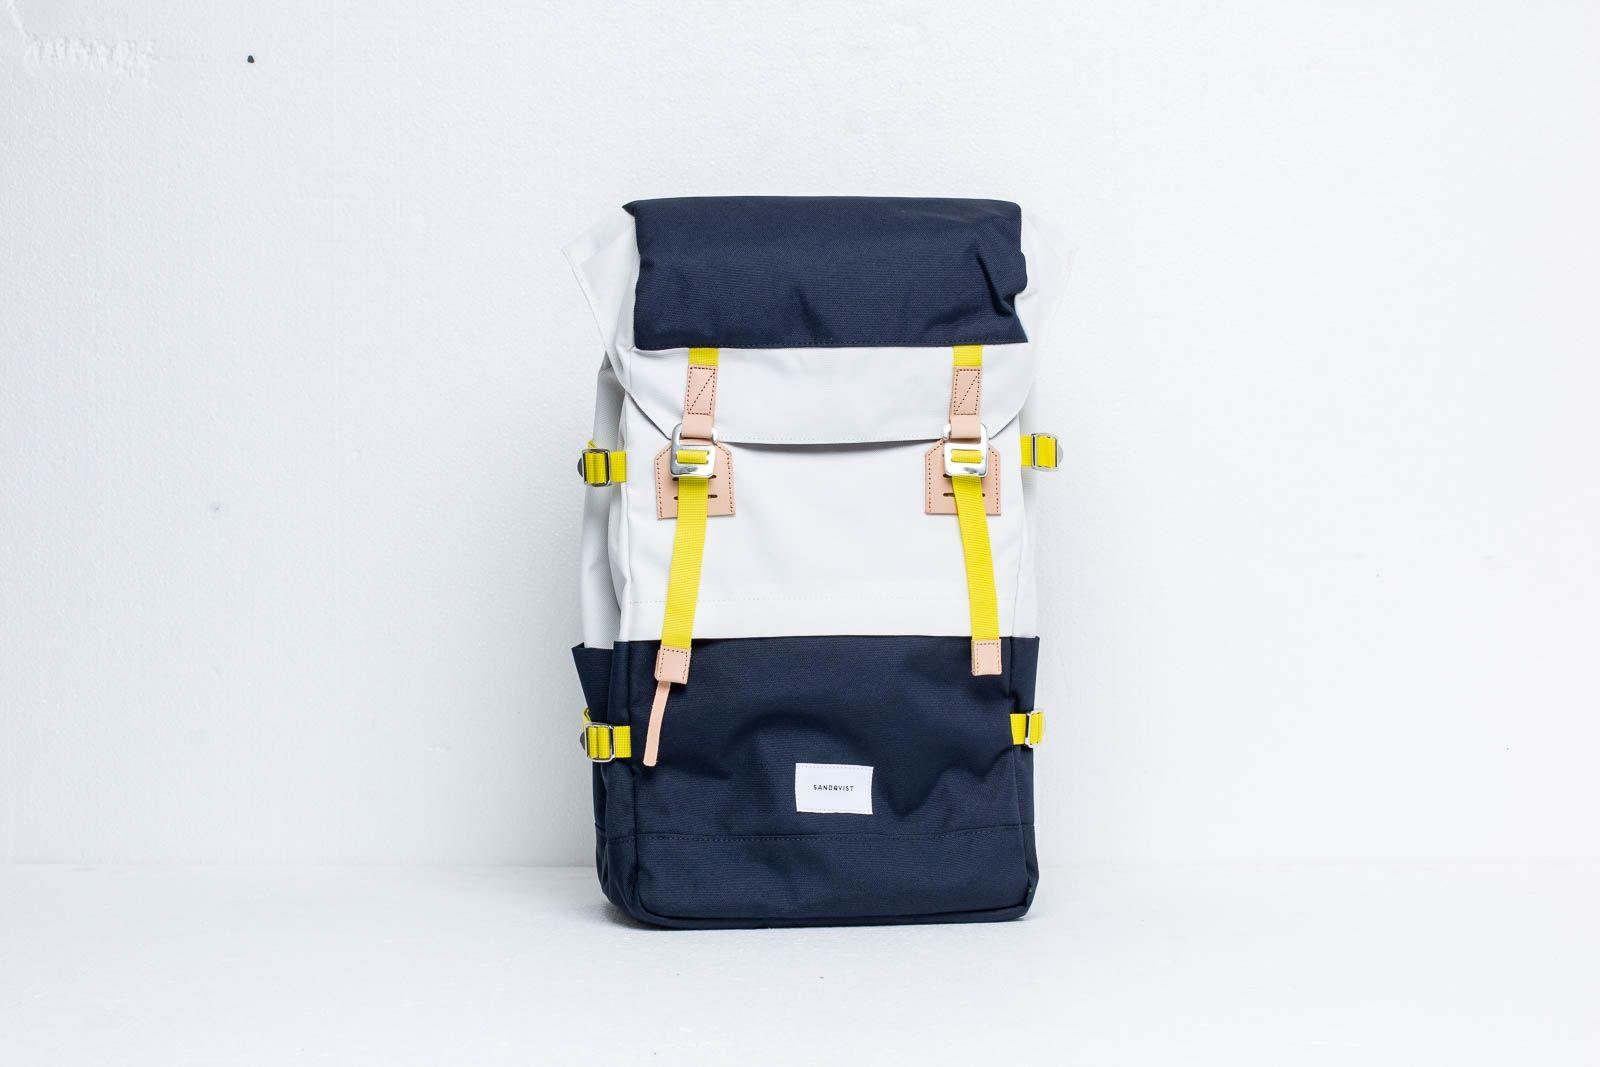 SANDQVIST Harald Backpack Multi Off-White/ Blue With Natural za skvelú cenu 107 € kúpite na Footshop.sk